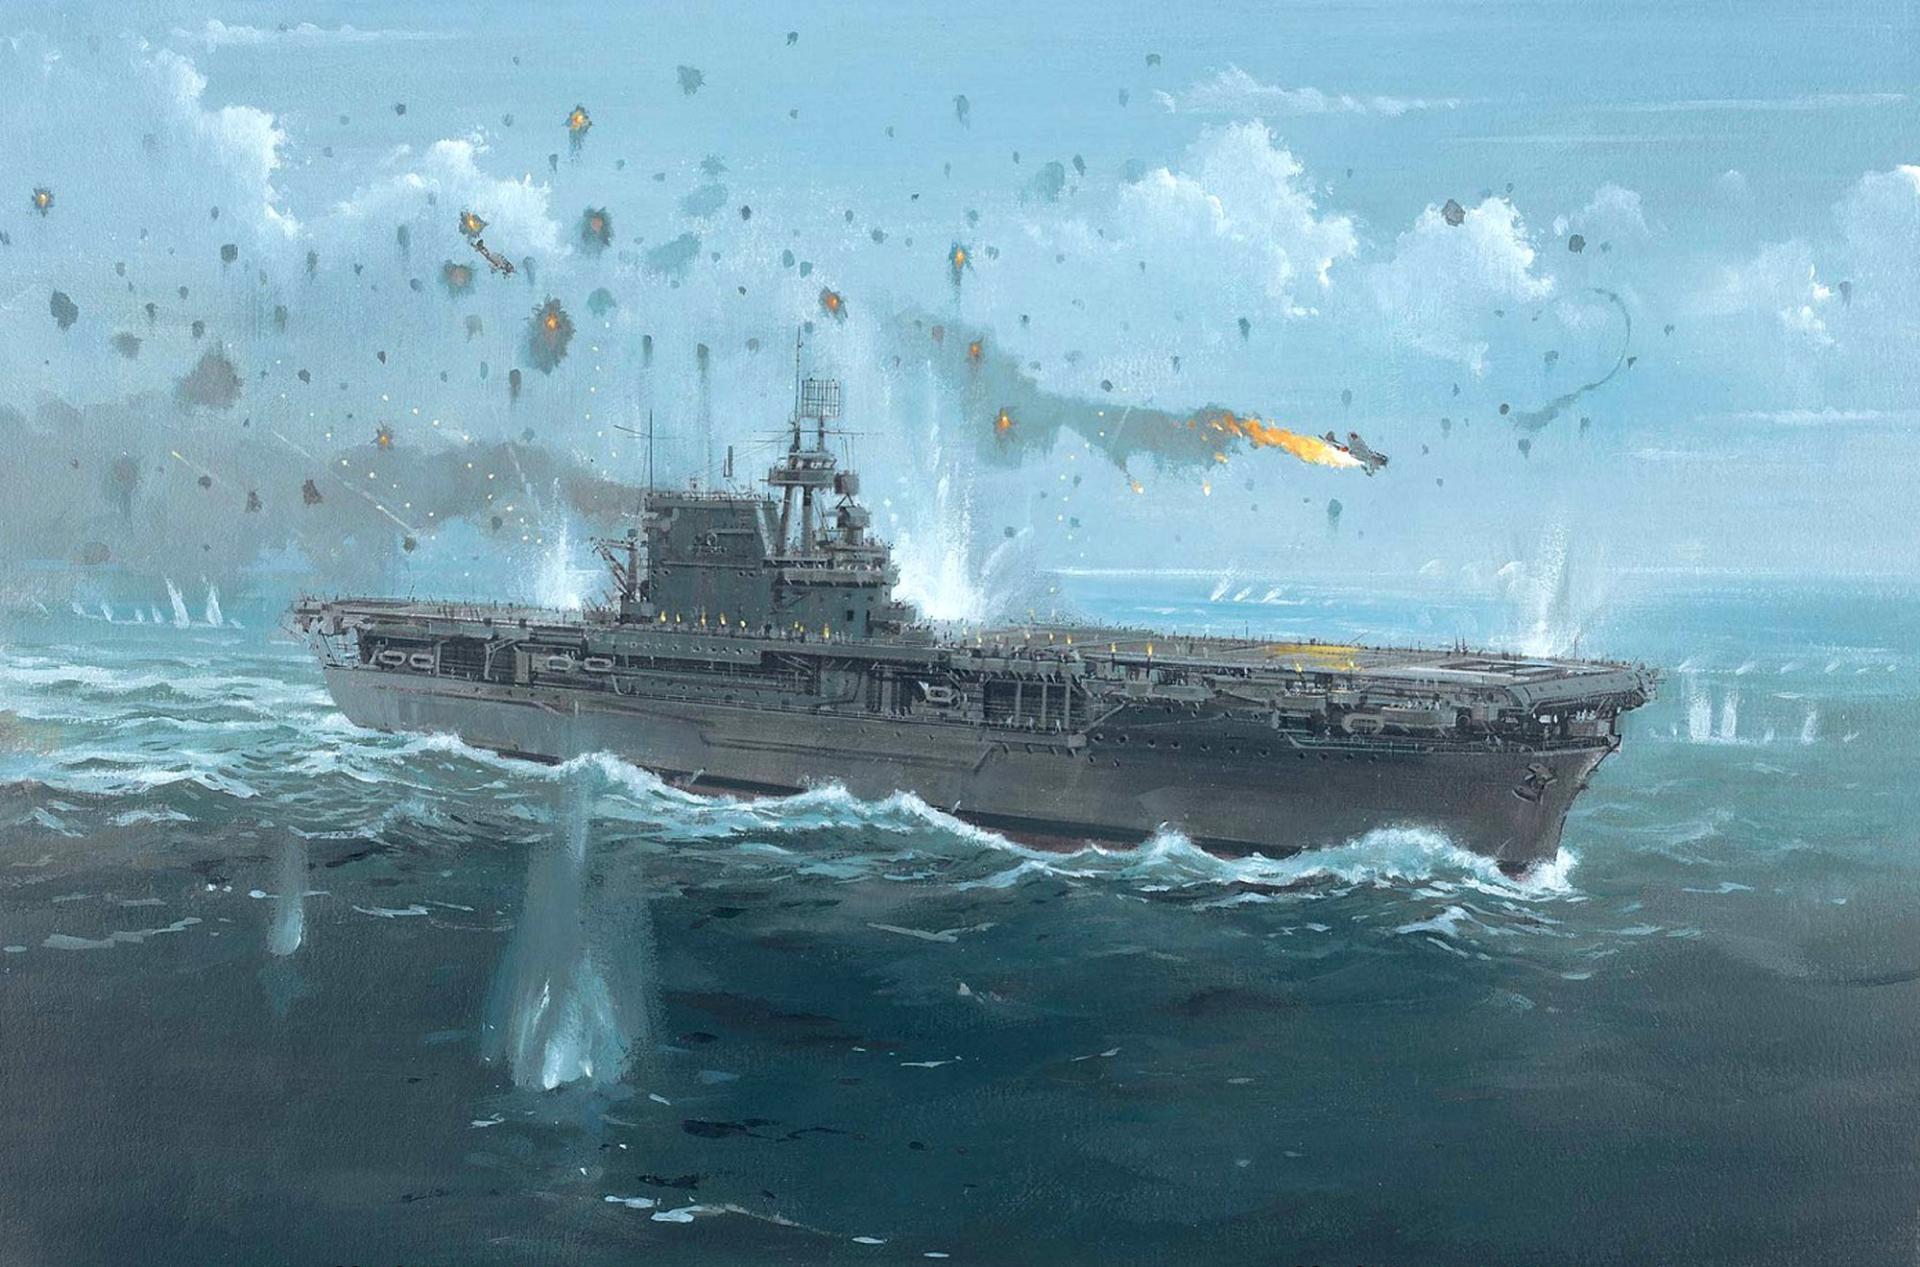 USS Enterprise (CV-6) wallpapers HD quality